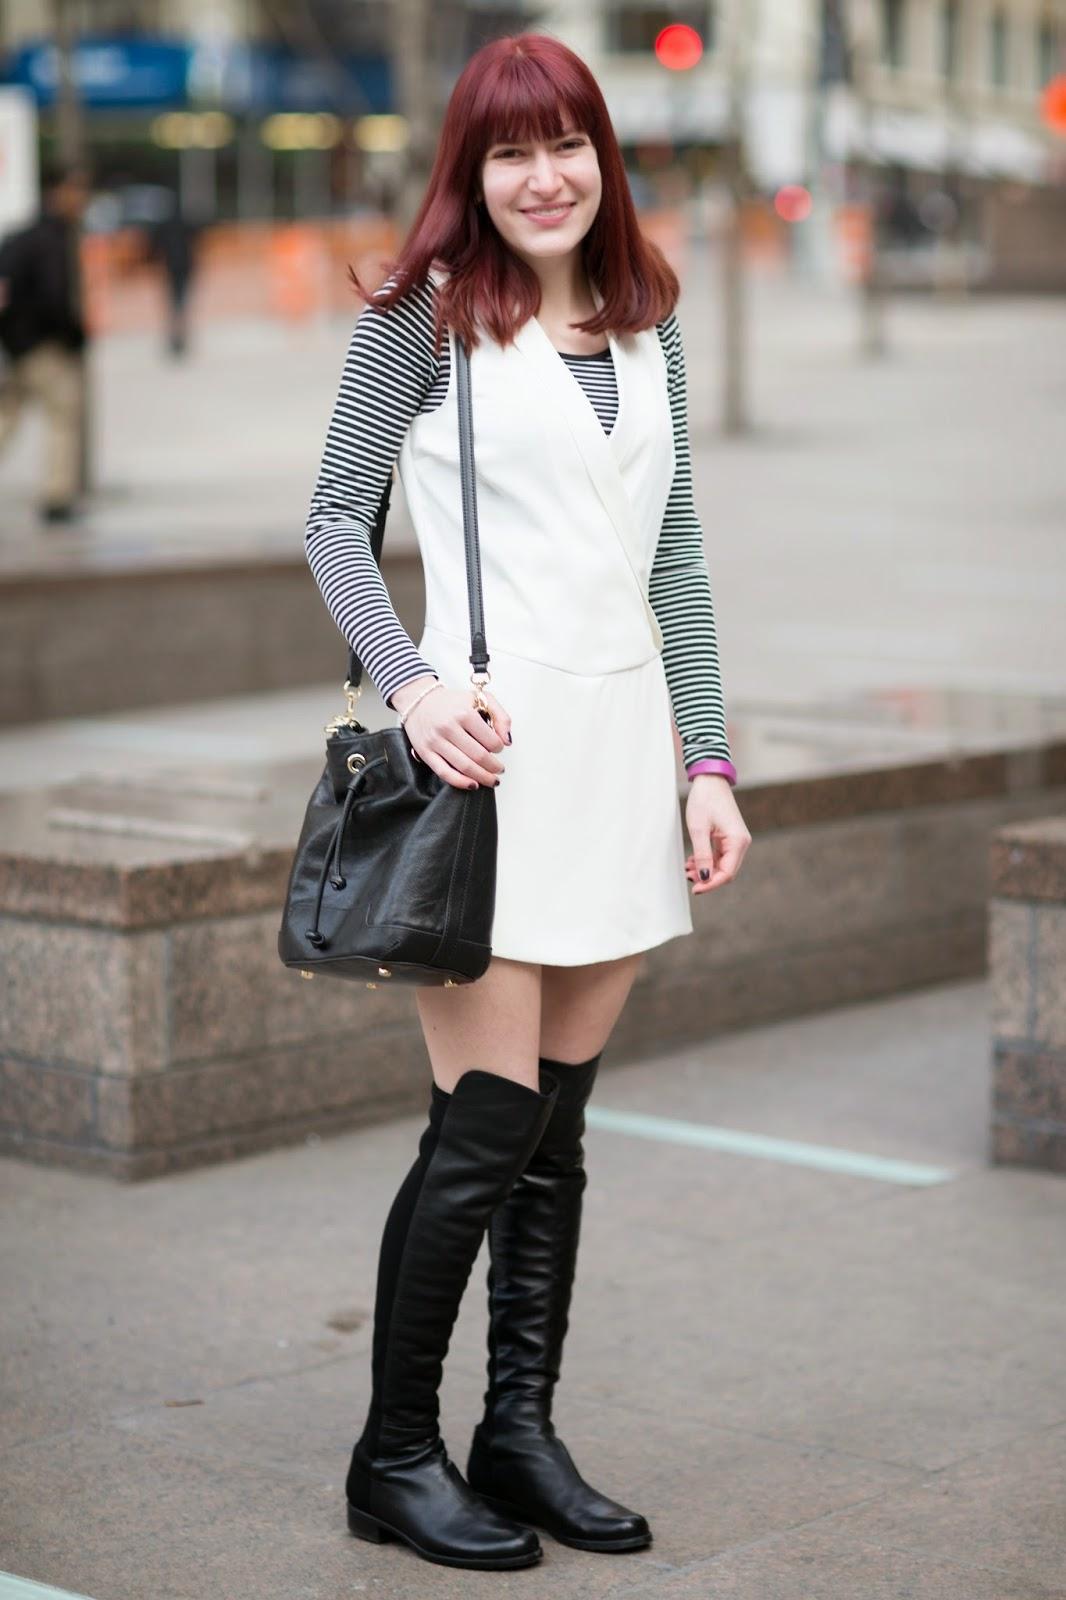 rebecca minkoff fiona bucket bag, stuart weitzman 5050, teen vogue fashion u, Teen vogue fashion university, topshop tux romper,